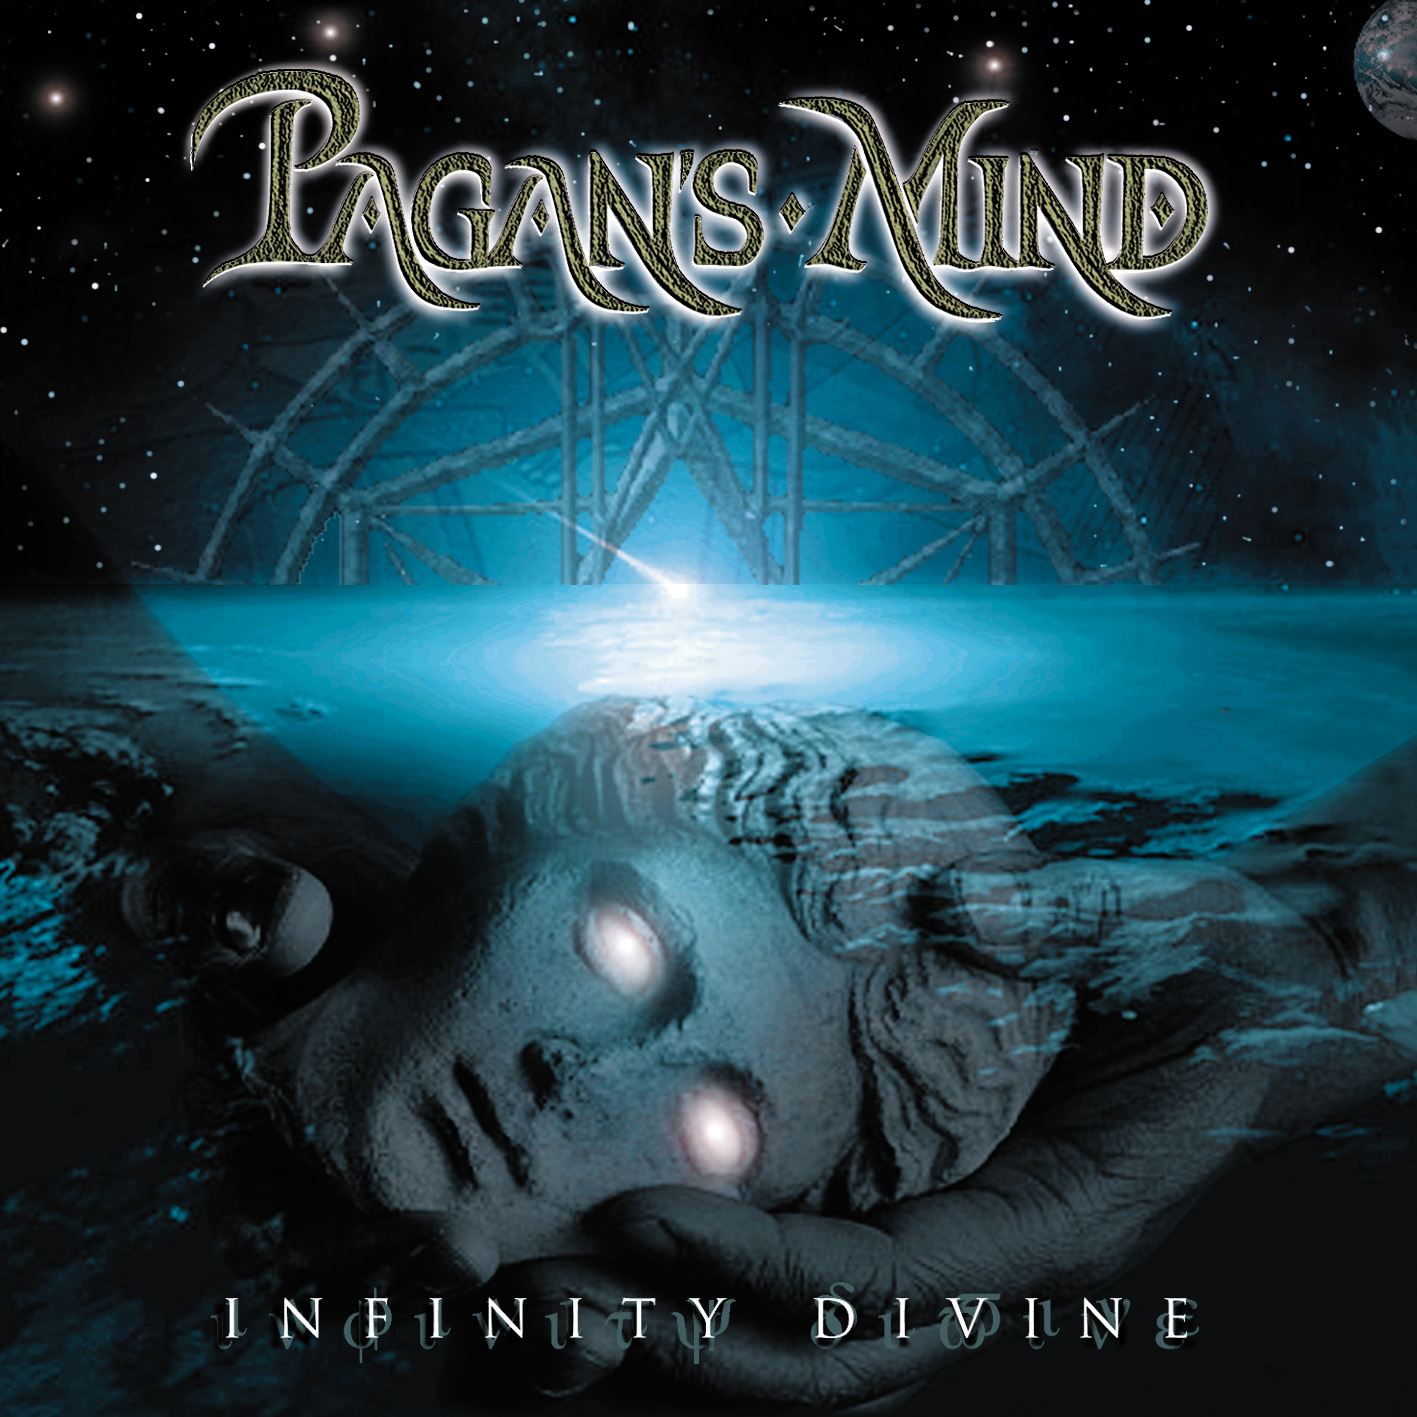 Infinity Divine front RGB 300 DPI